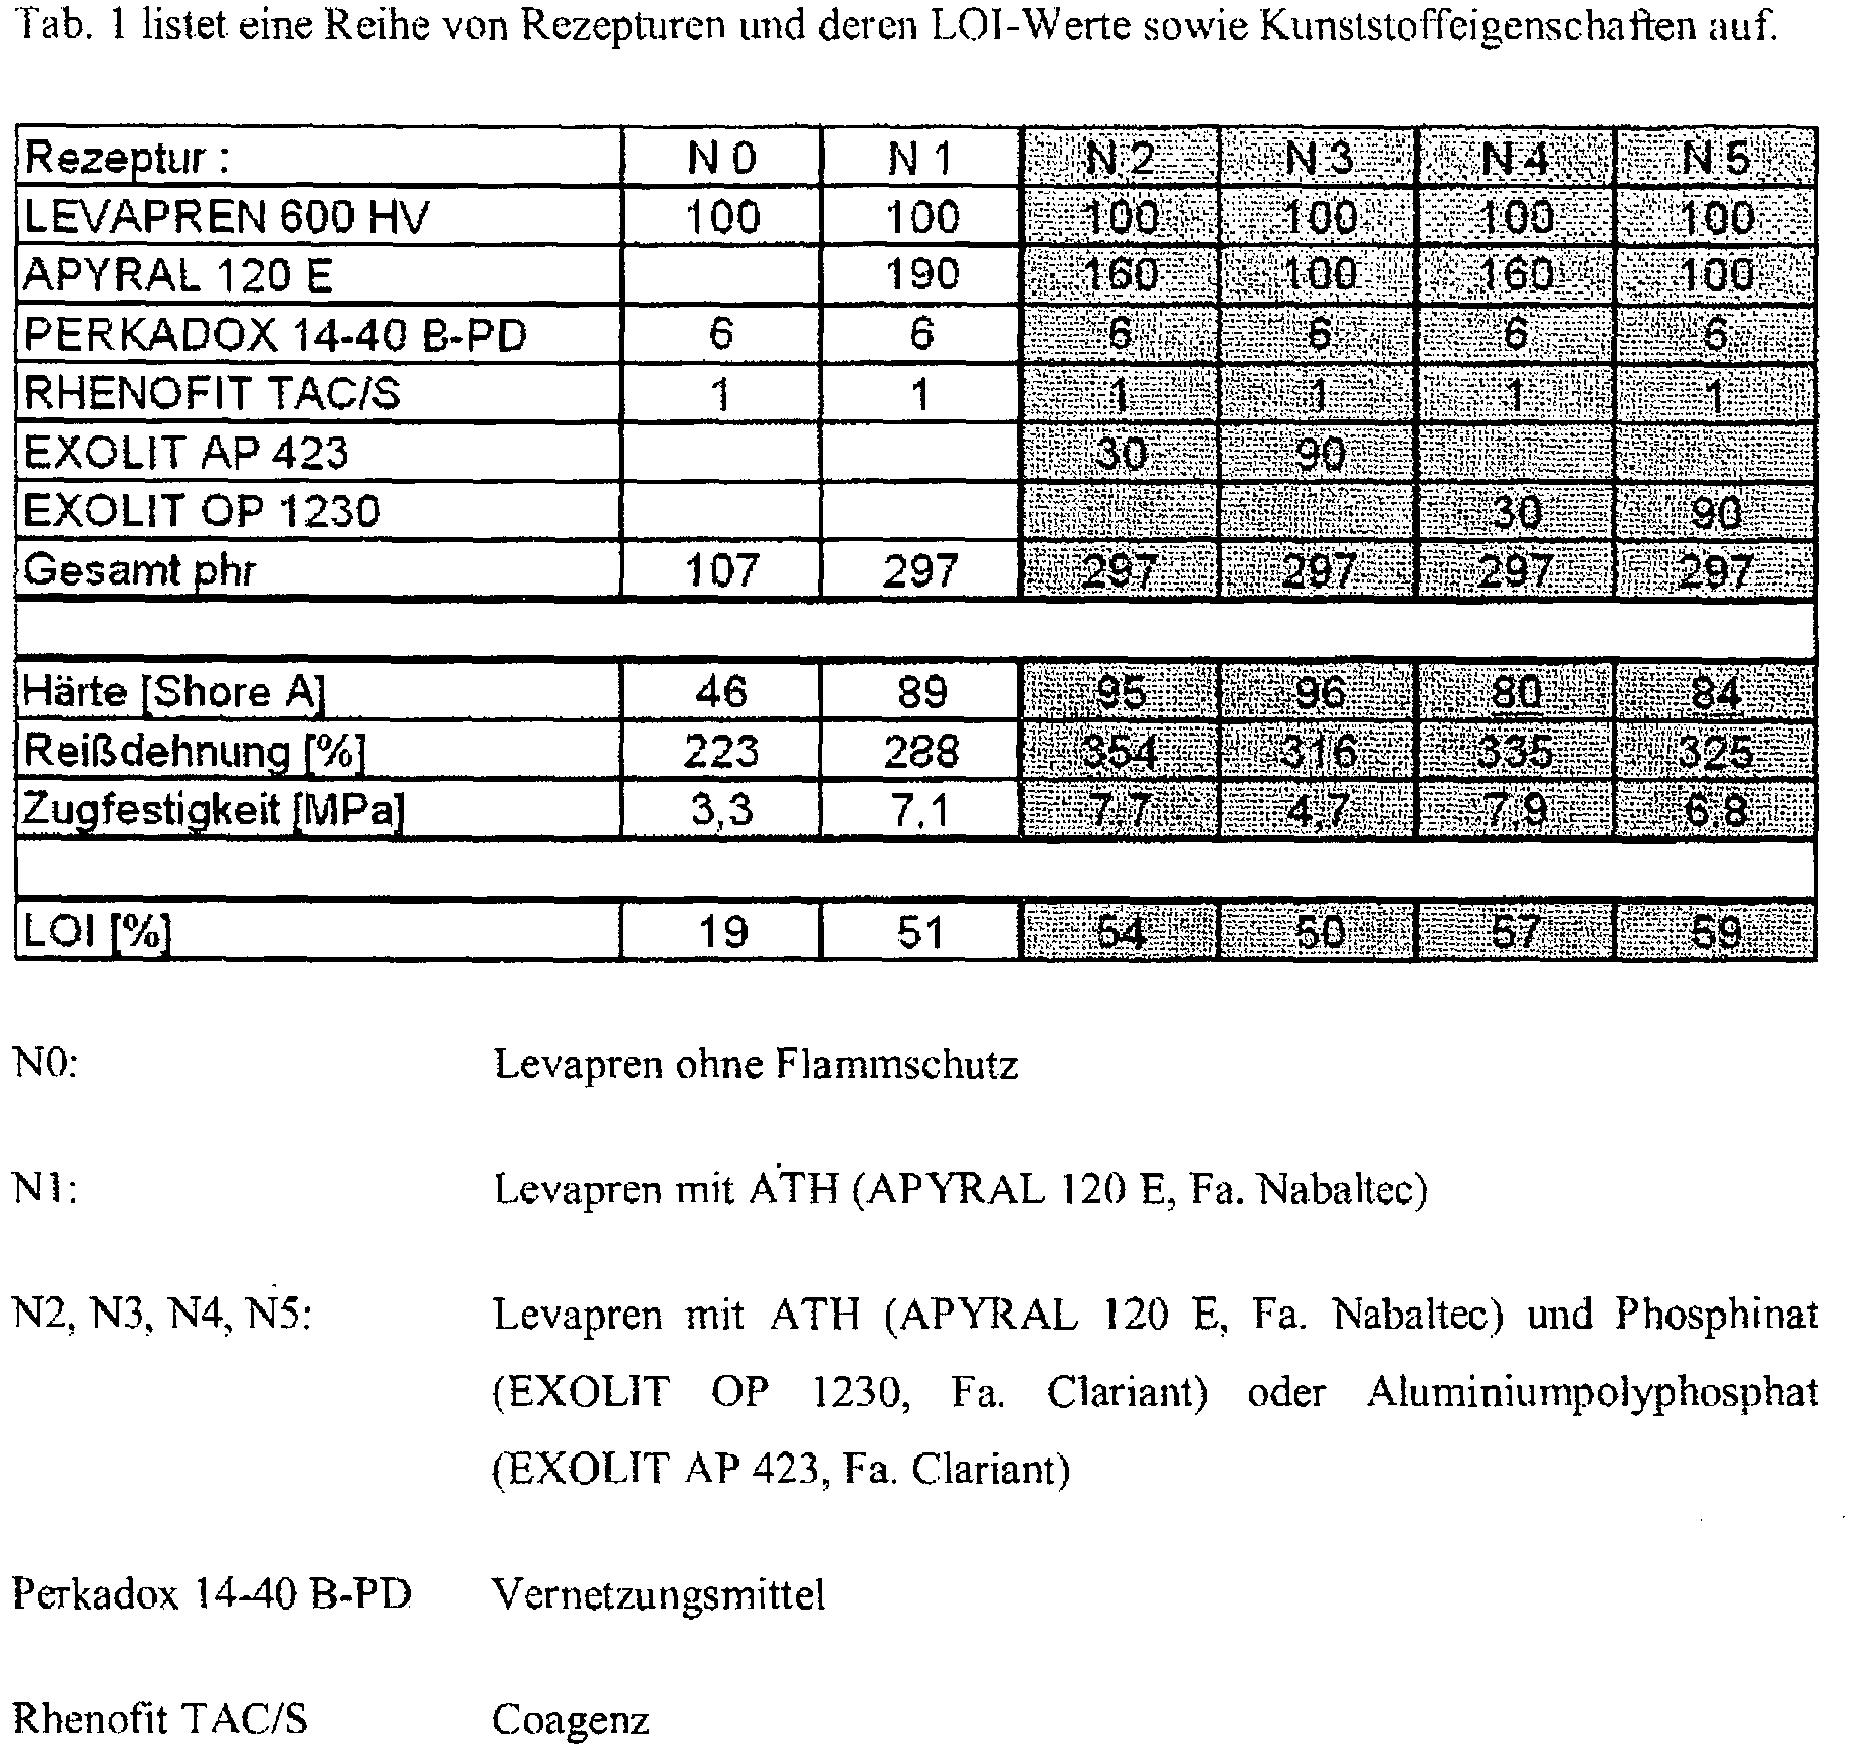 Atemberaubend Kabelisolationstypen Tabelle Fotos - Der Schaltplan ...